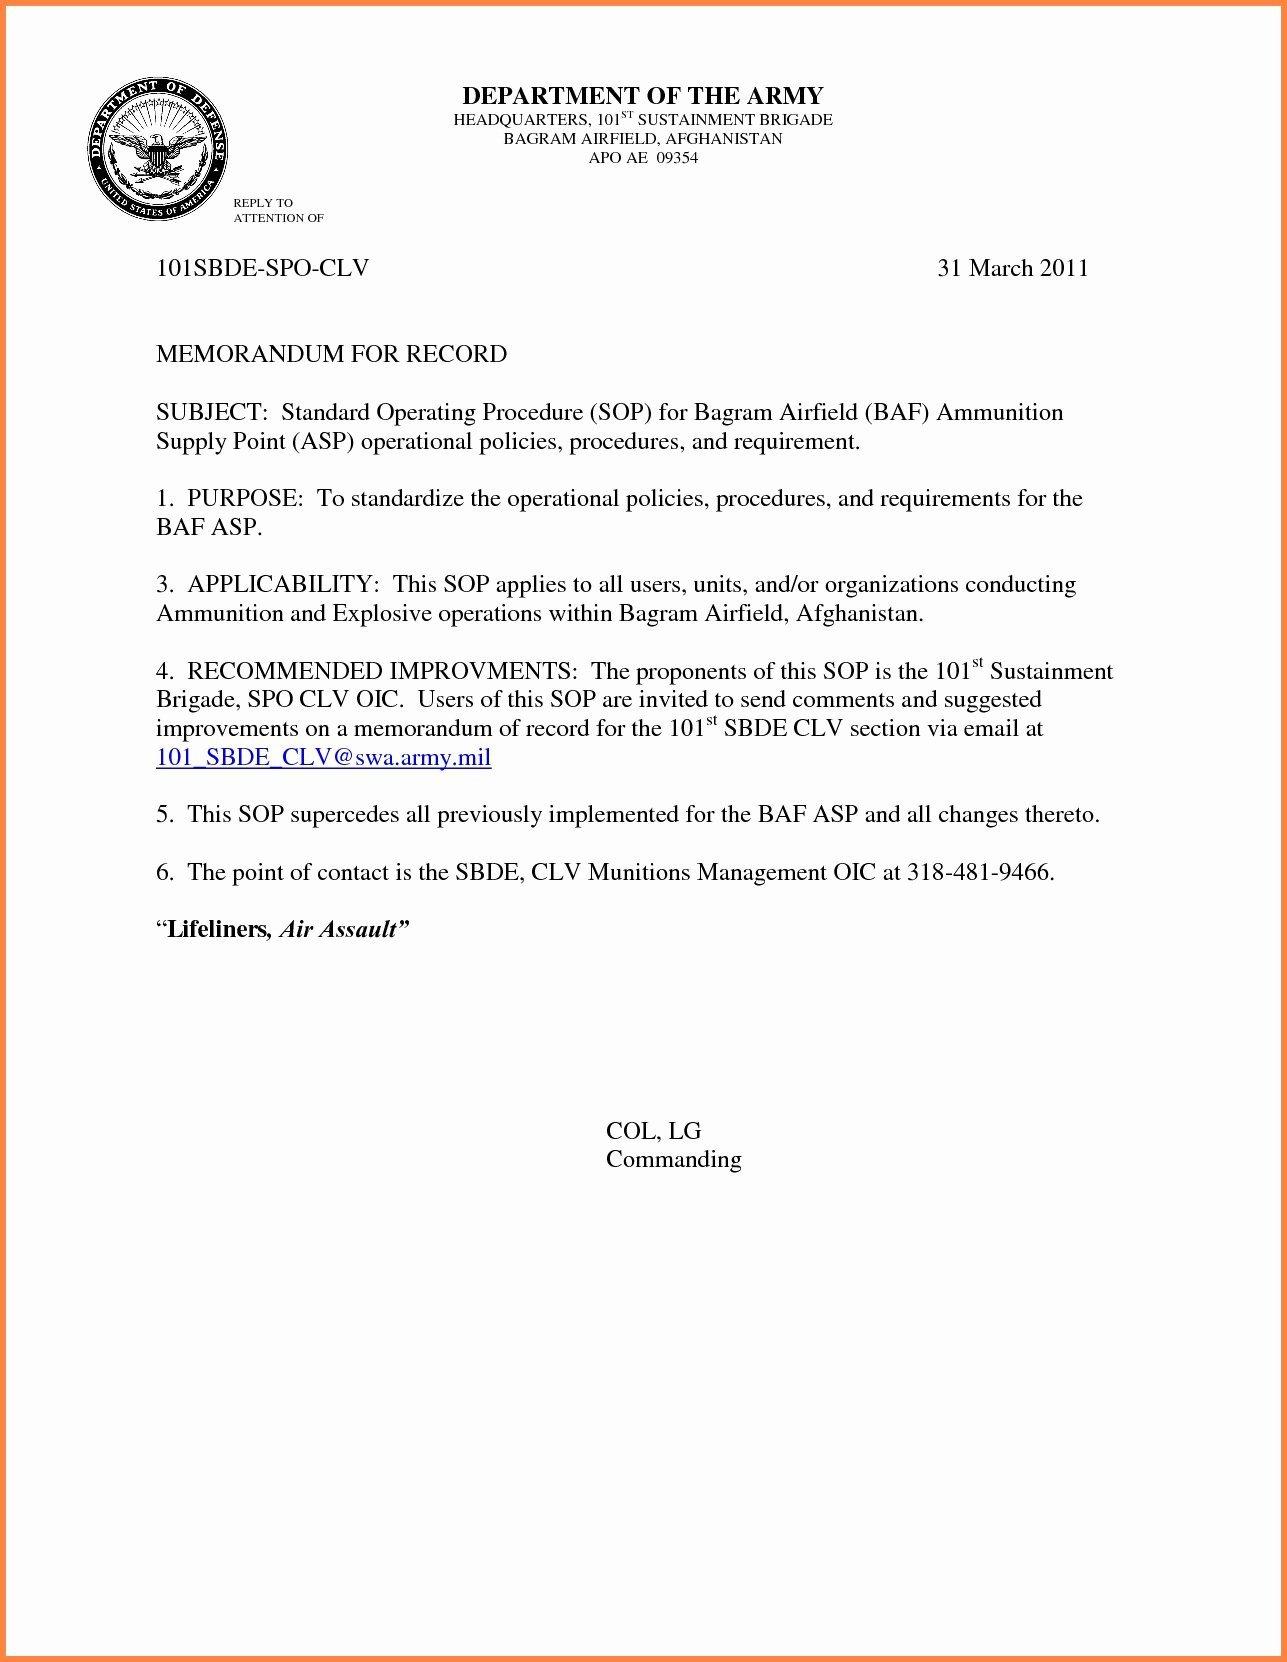 Memorandum for Record Army Army Memorandum for Record Template